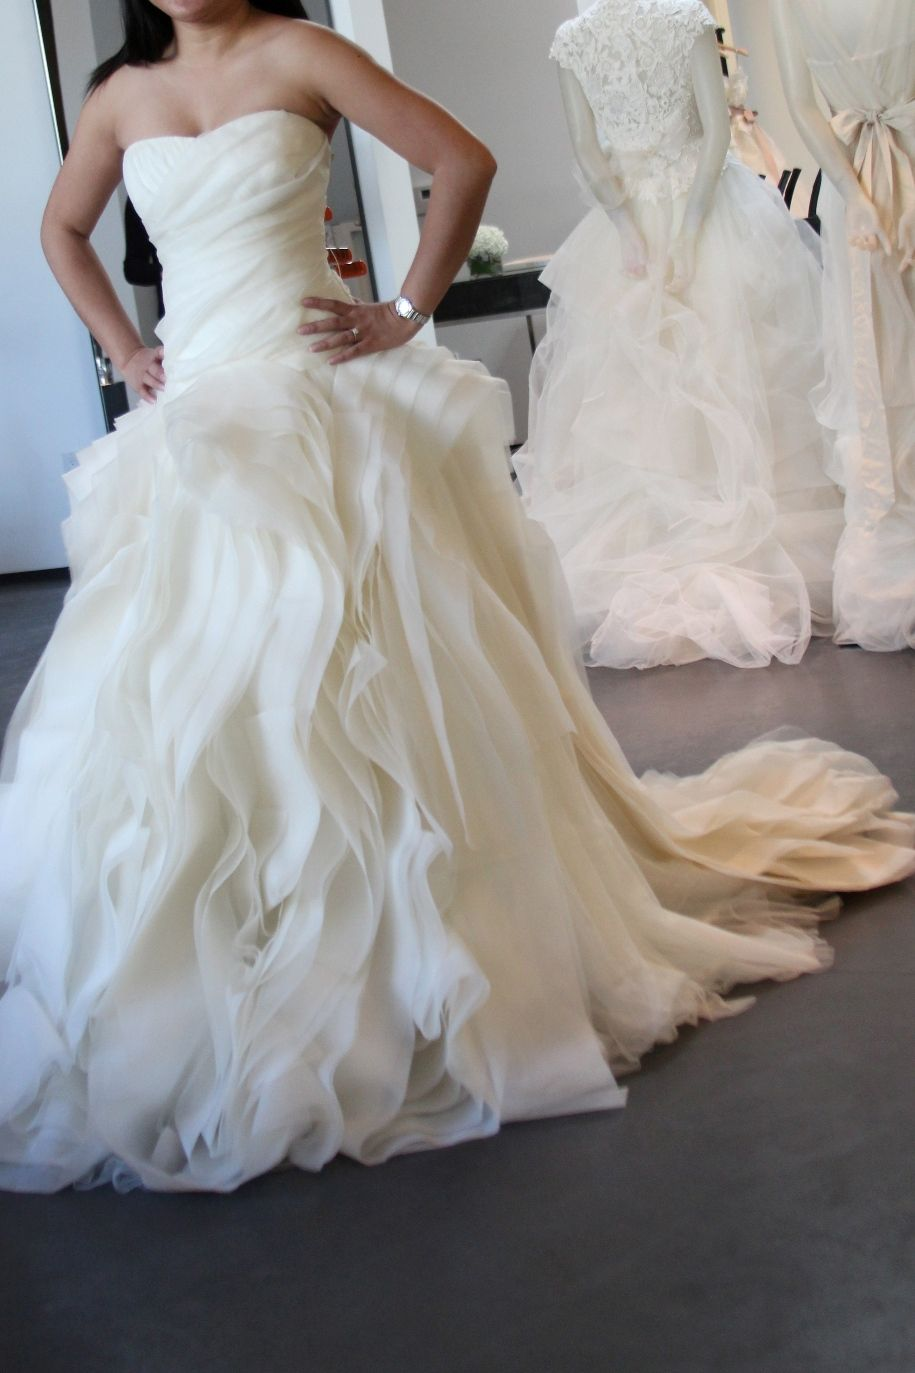 Vera wang diana dress my dream wedding gown!! I would wear